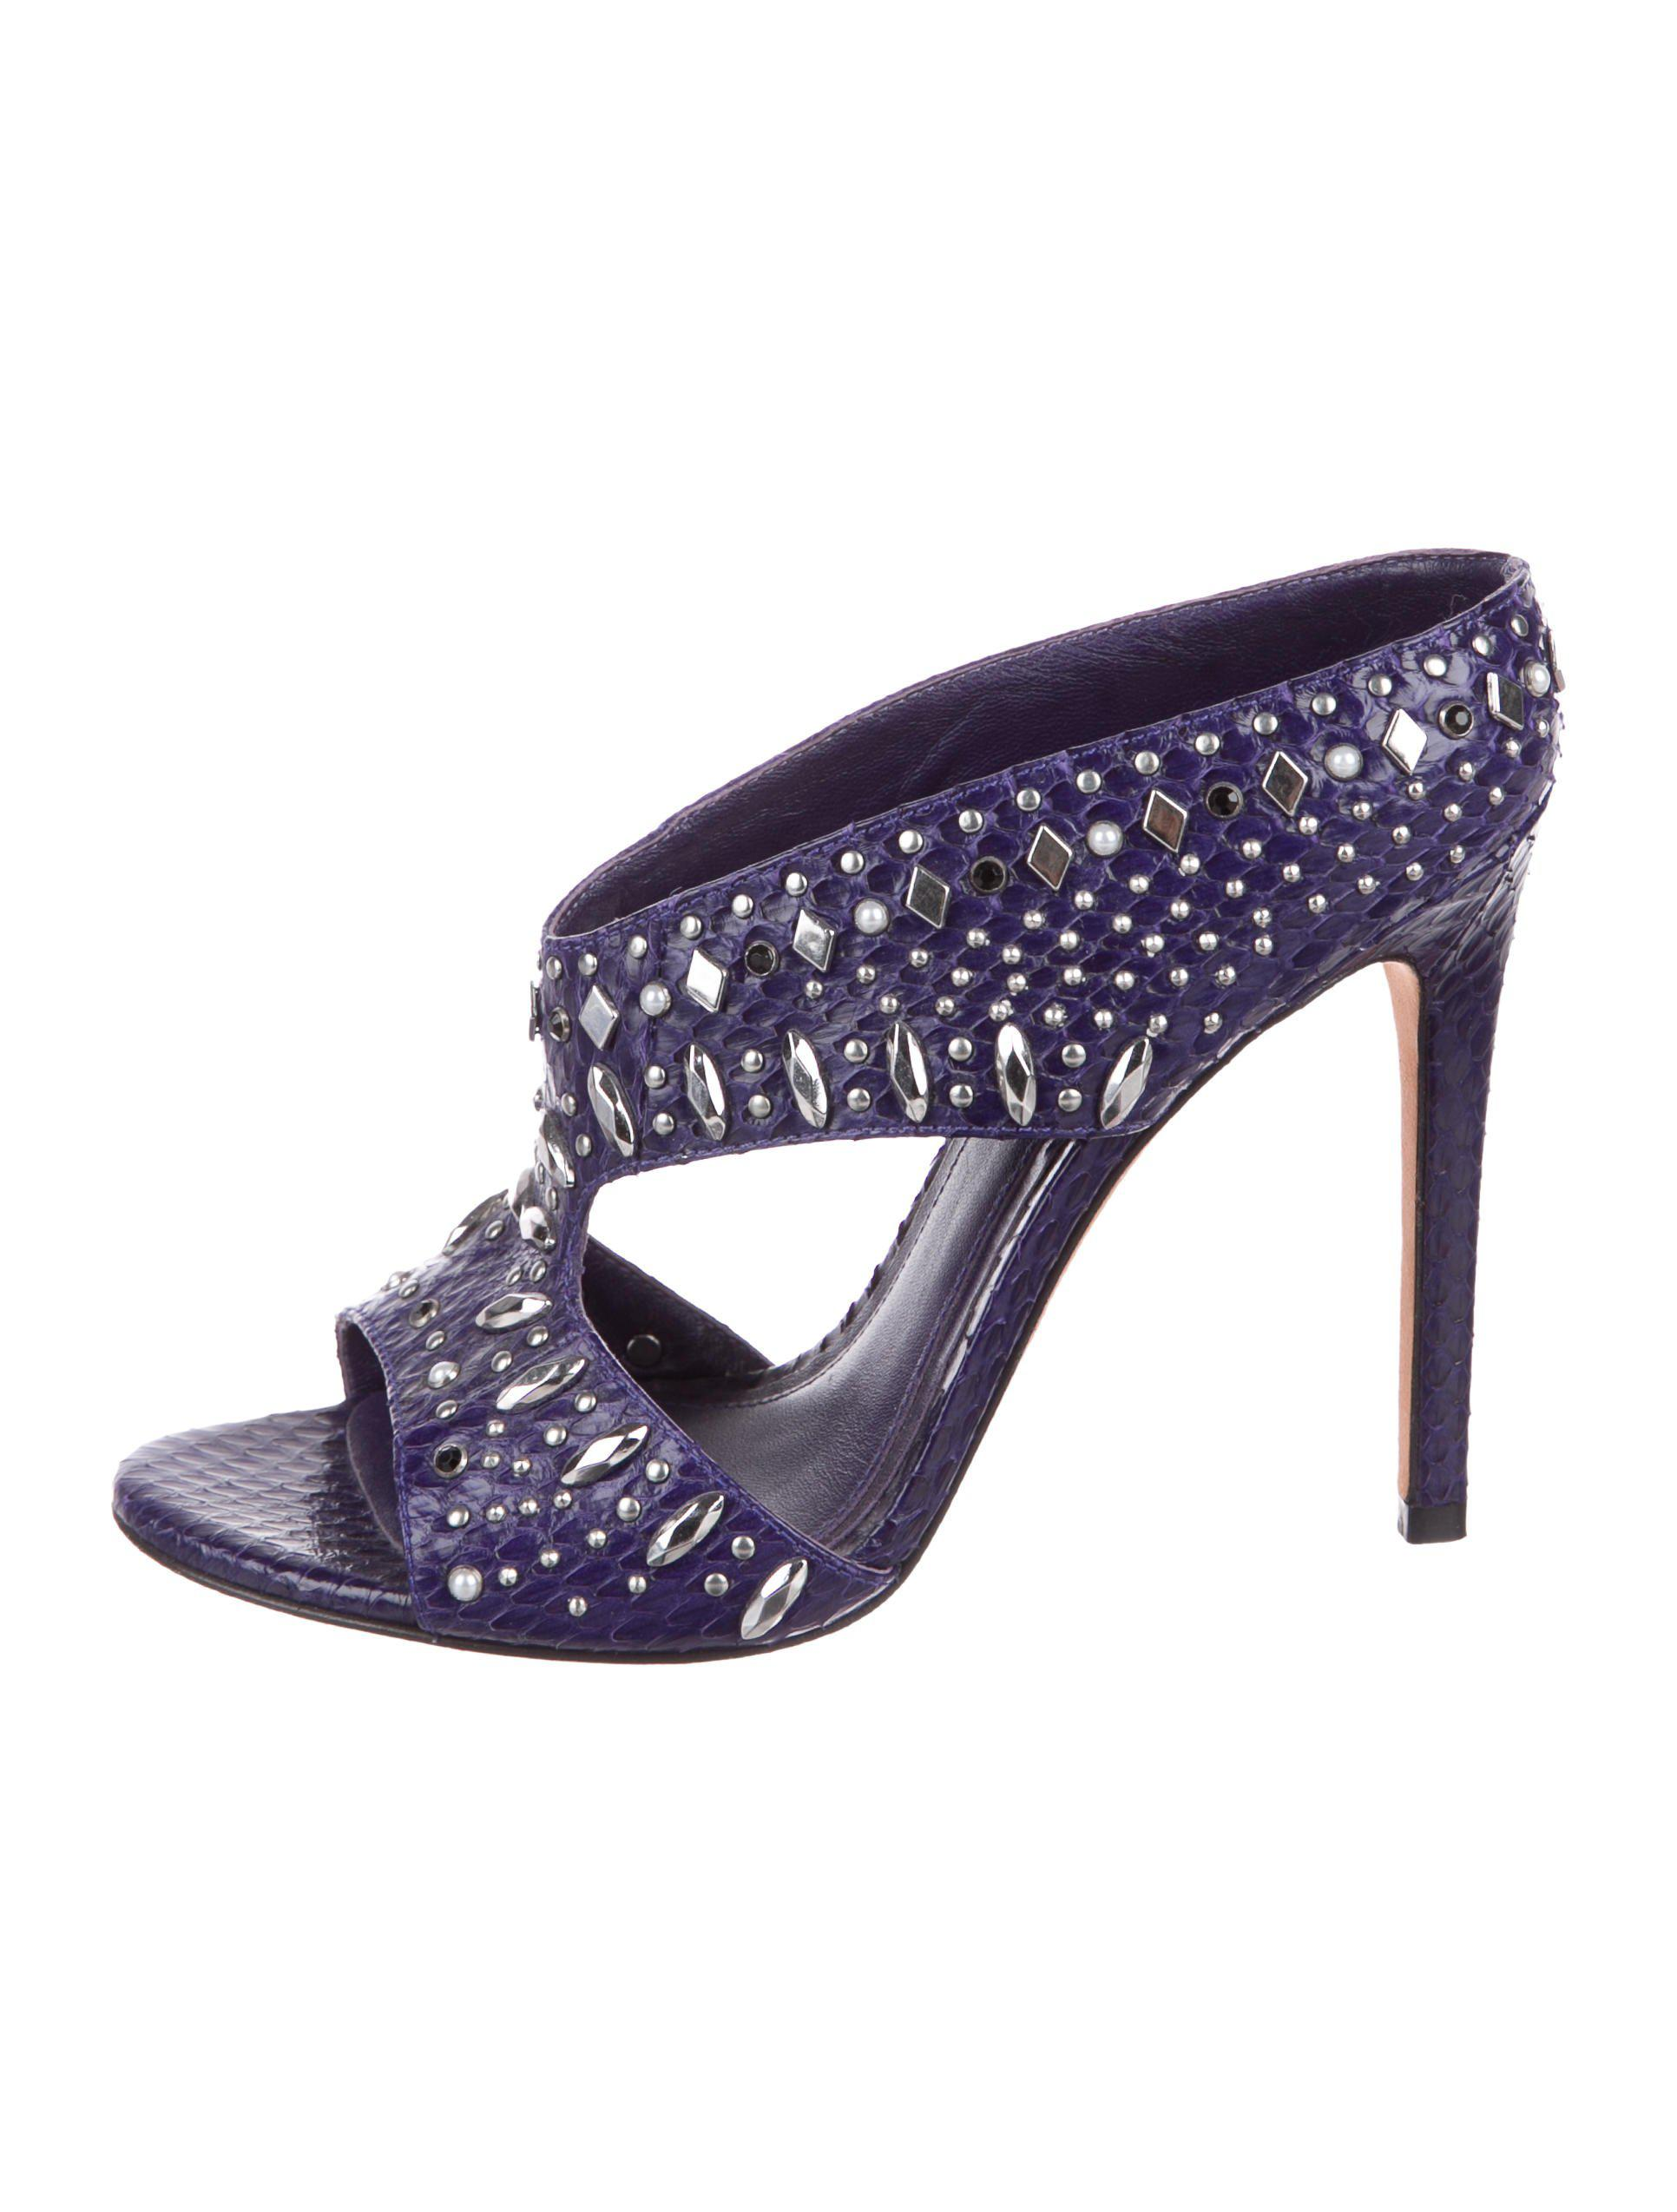 B Brian Atwood Snakeskin Embellished Sandals sale geniue stockist best cheap online cheap sale recommend buy cheap wholesale price cheap sale view gzDUFJ9Q